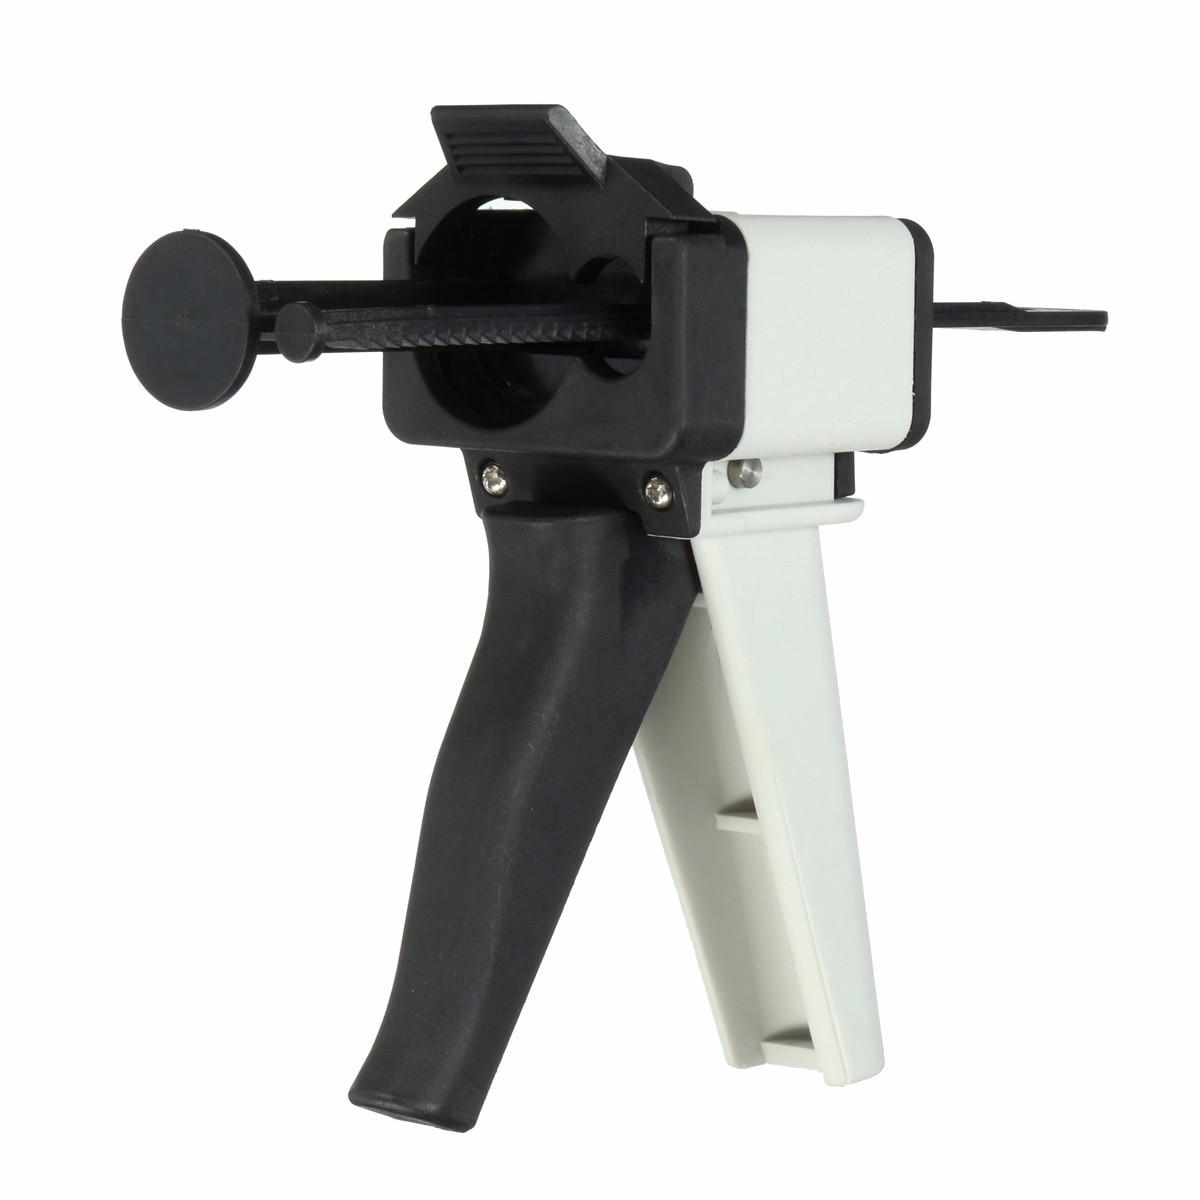 Dental Impressions Mixing Dispensing G Un 10:1 Universal Handgun Silicon Rubber Cartridge Dispenser 50ml Oral Care Material